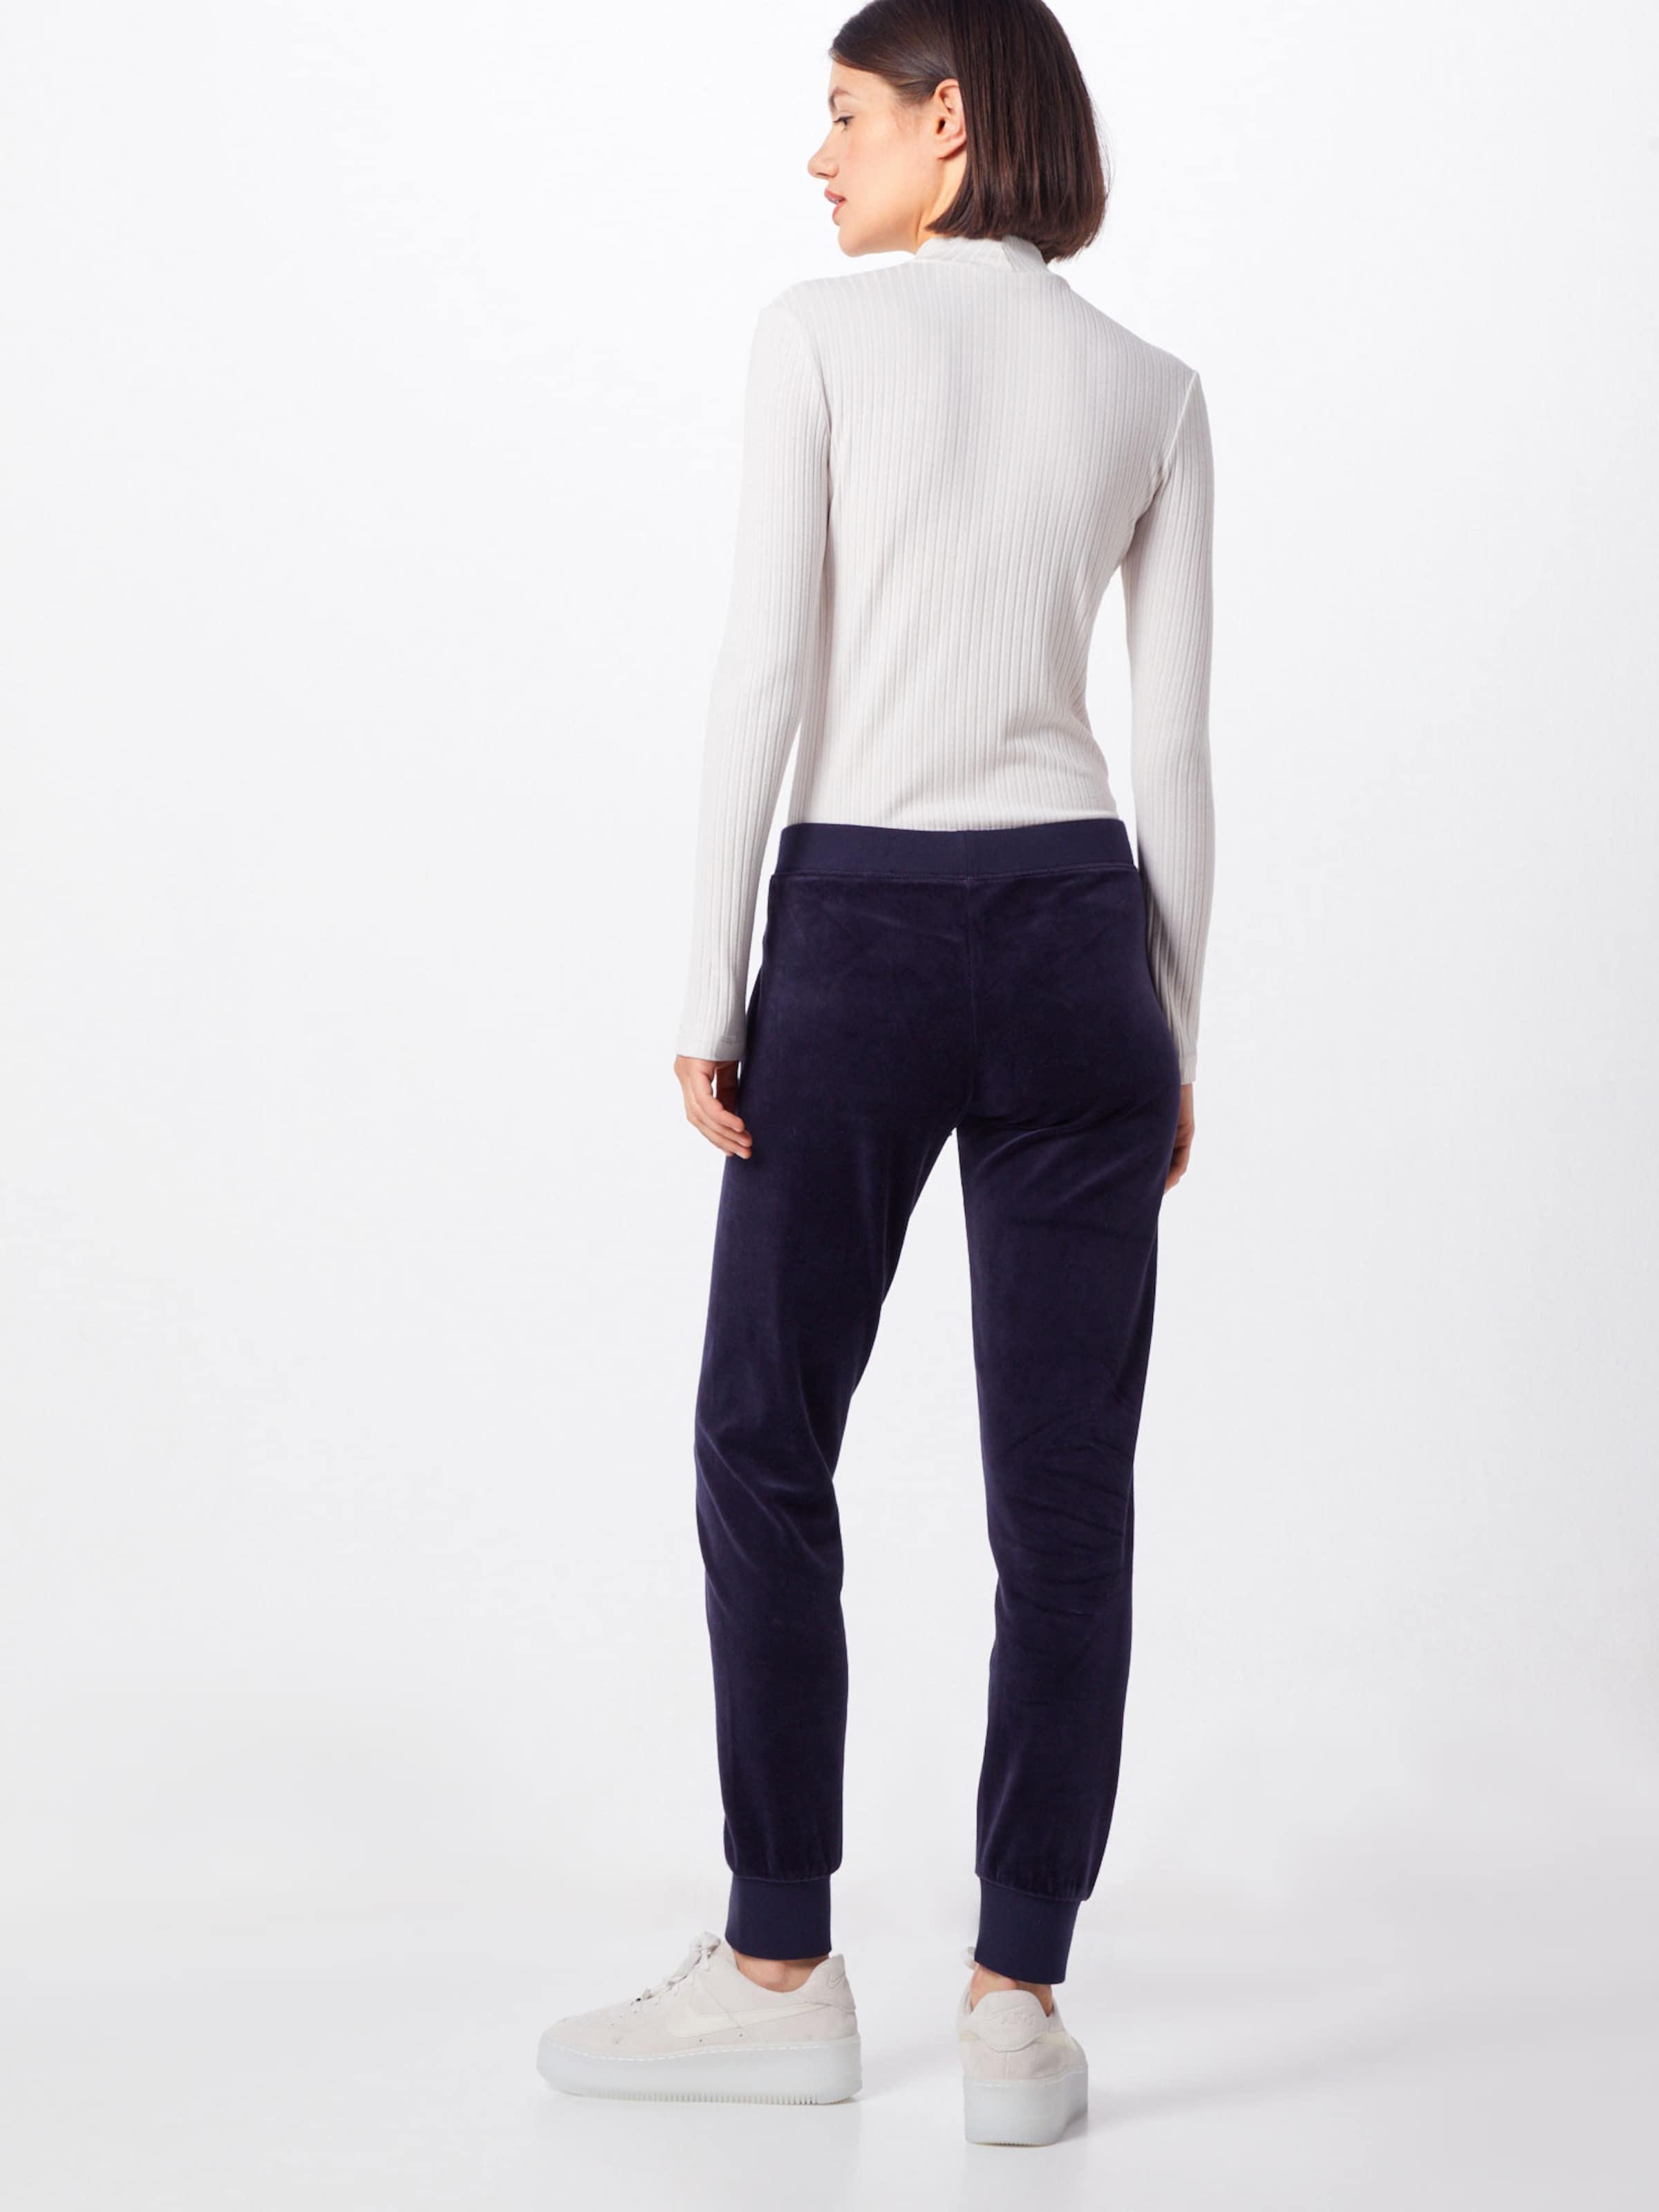 Nachtblau Juicy Black 'velour Couture Label Samthose Zuma' In 5ARc43jLq